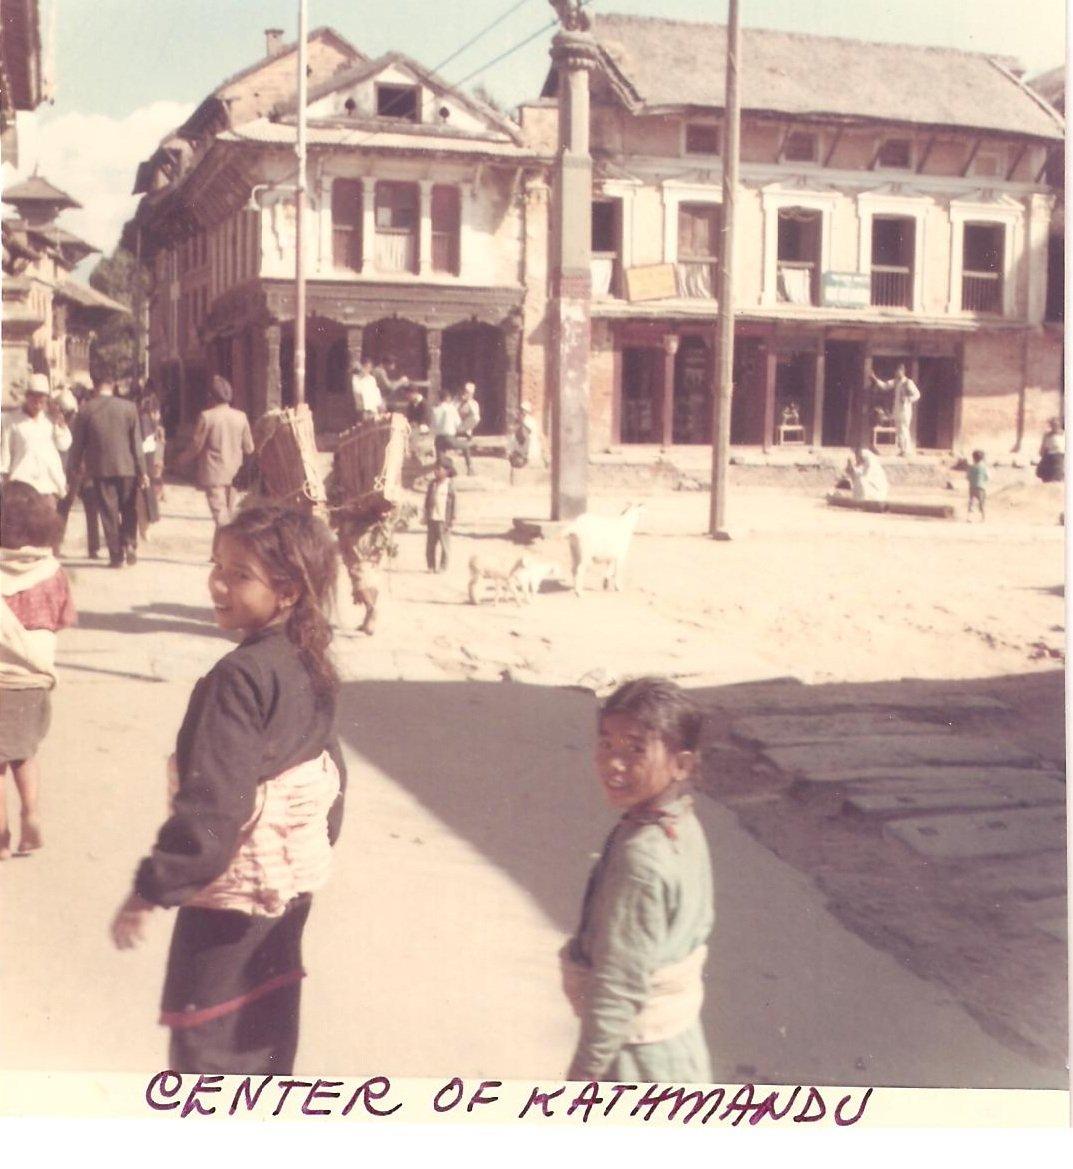 Vintage Photograph Center Kathmandu Children Walking Nepal 1968